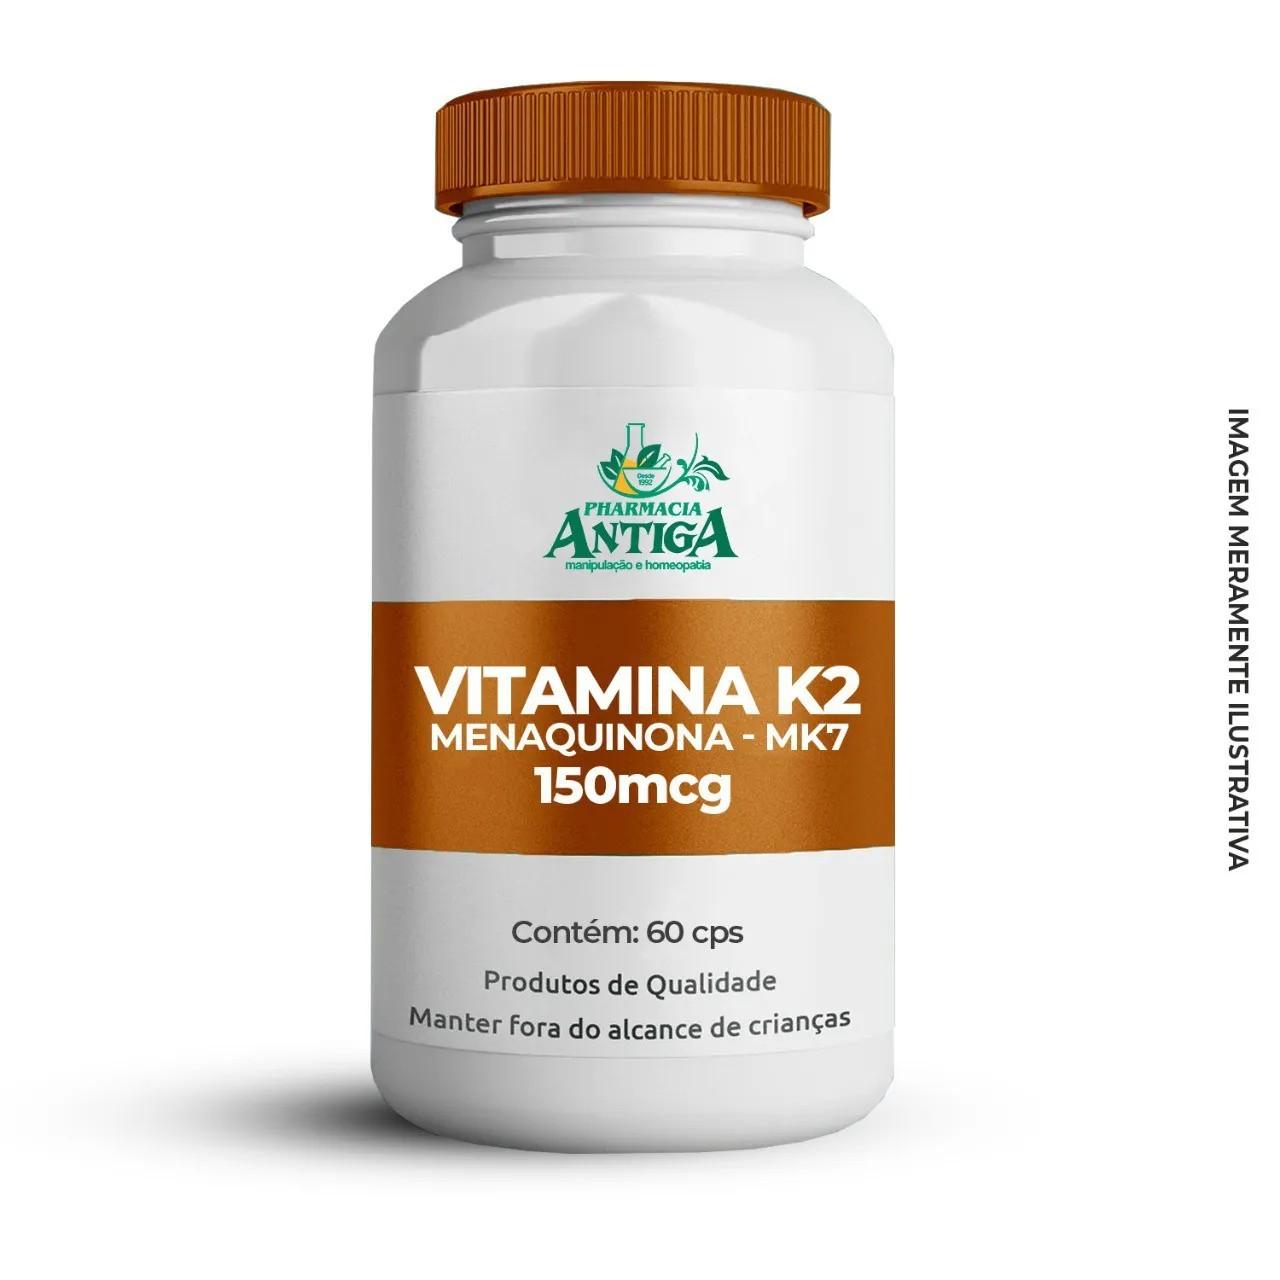 Vitamina K2 - Menaquinona MK7 150 mcg 60 cps